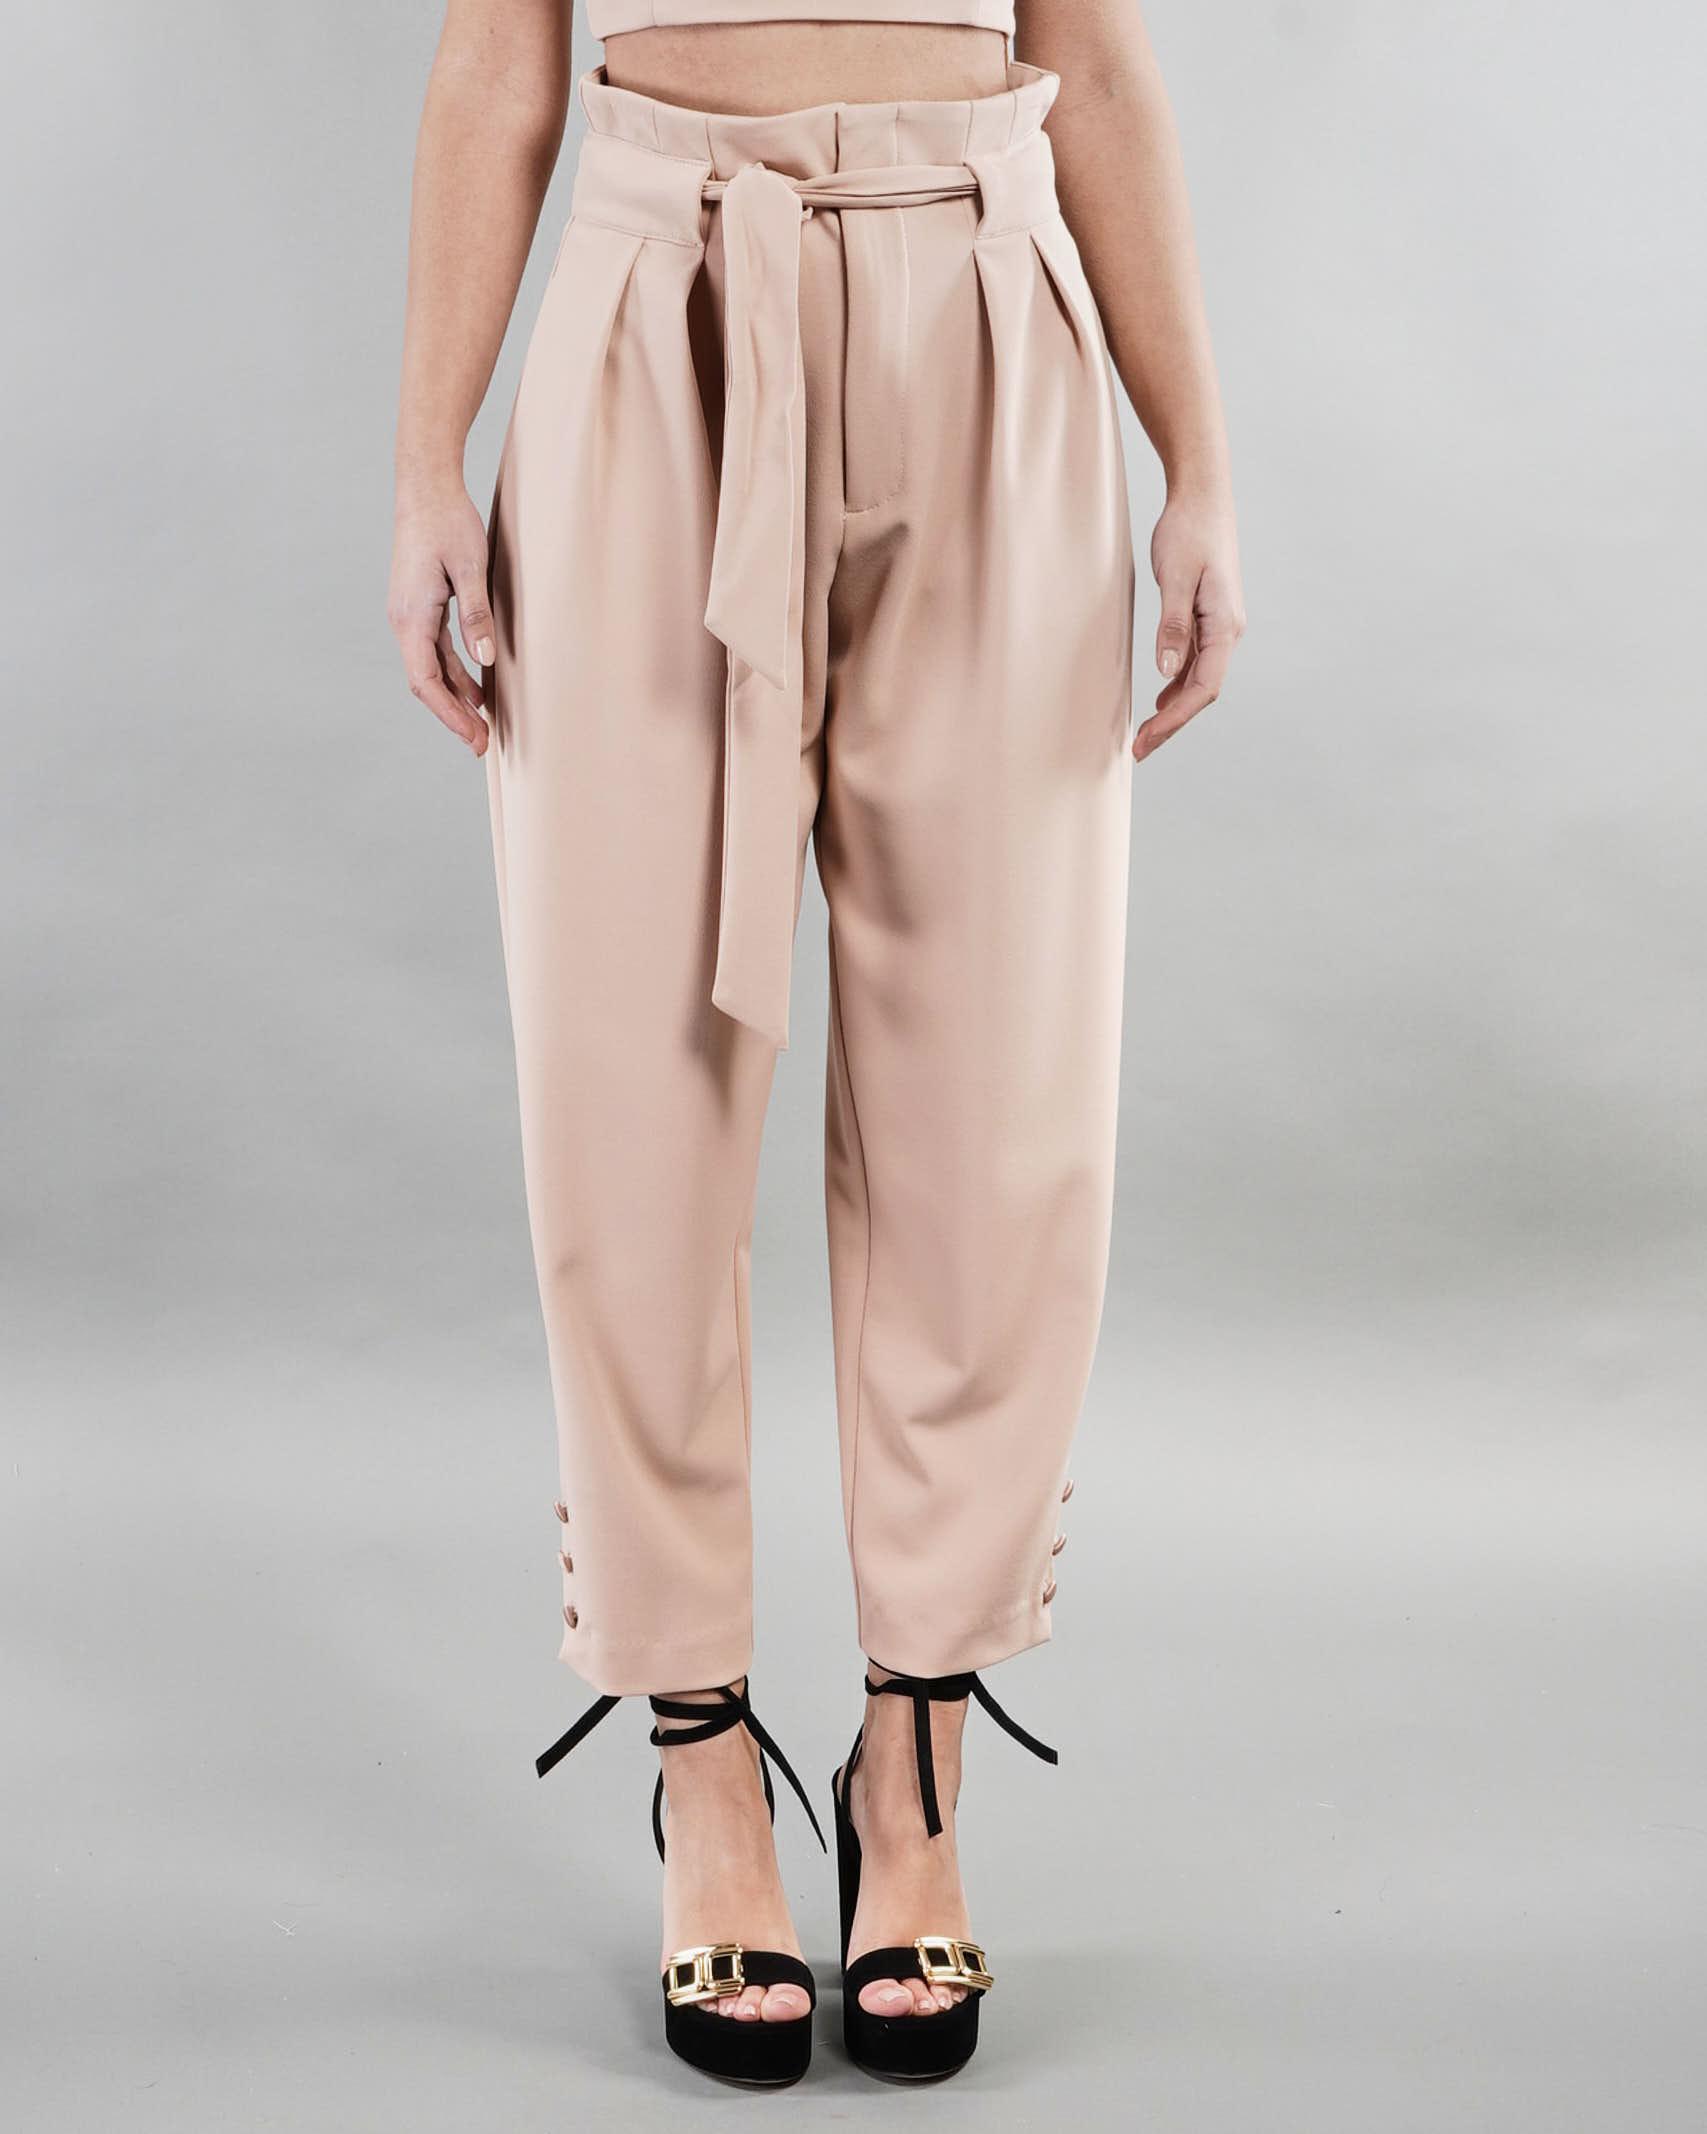 Pantalone curved line con cintura e pences Imperial IMPERIAL | Pantalone | P2E6BBKCAMMELLO